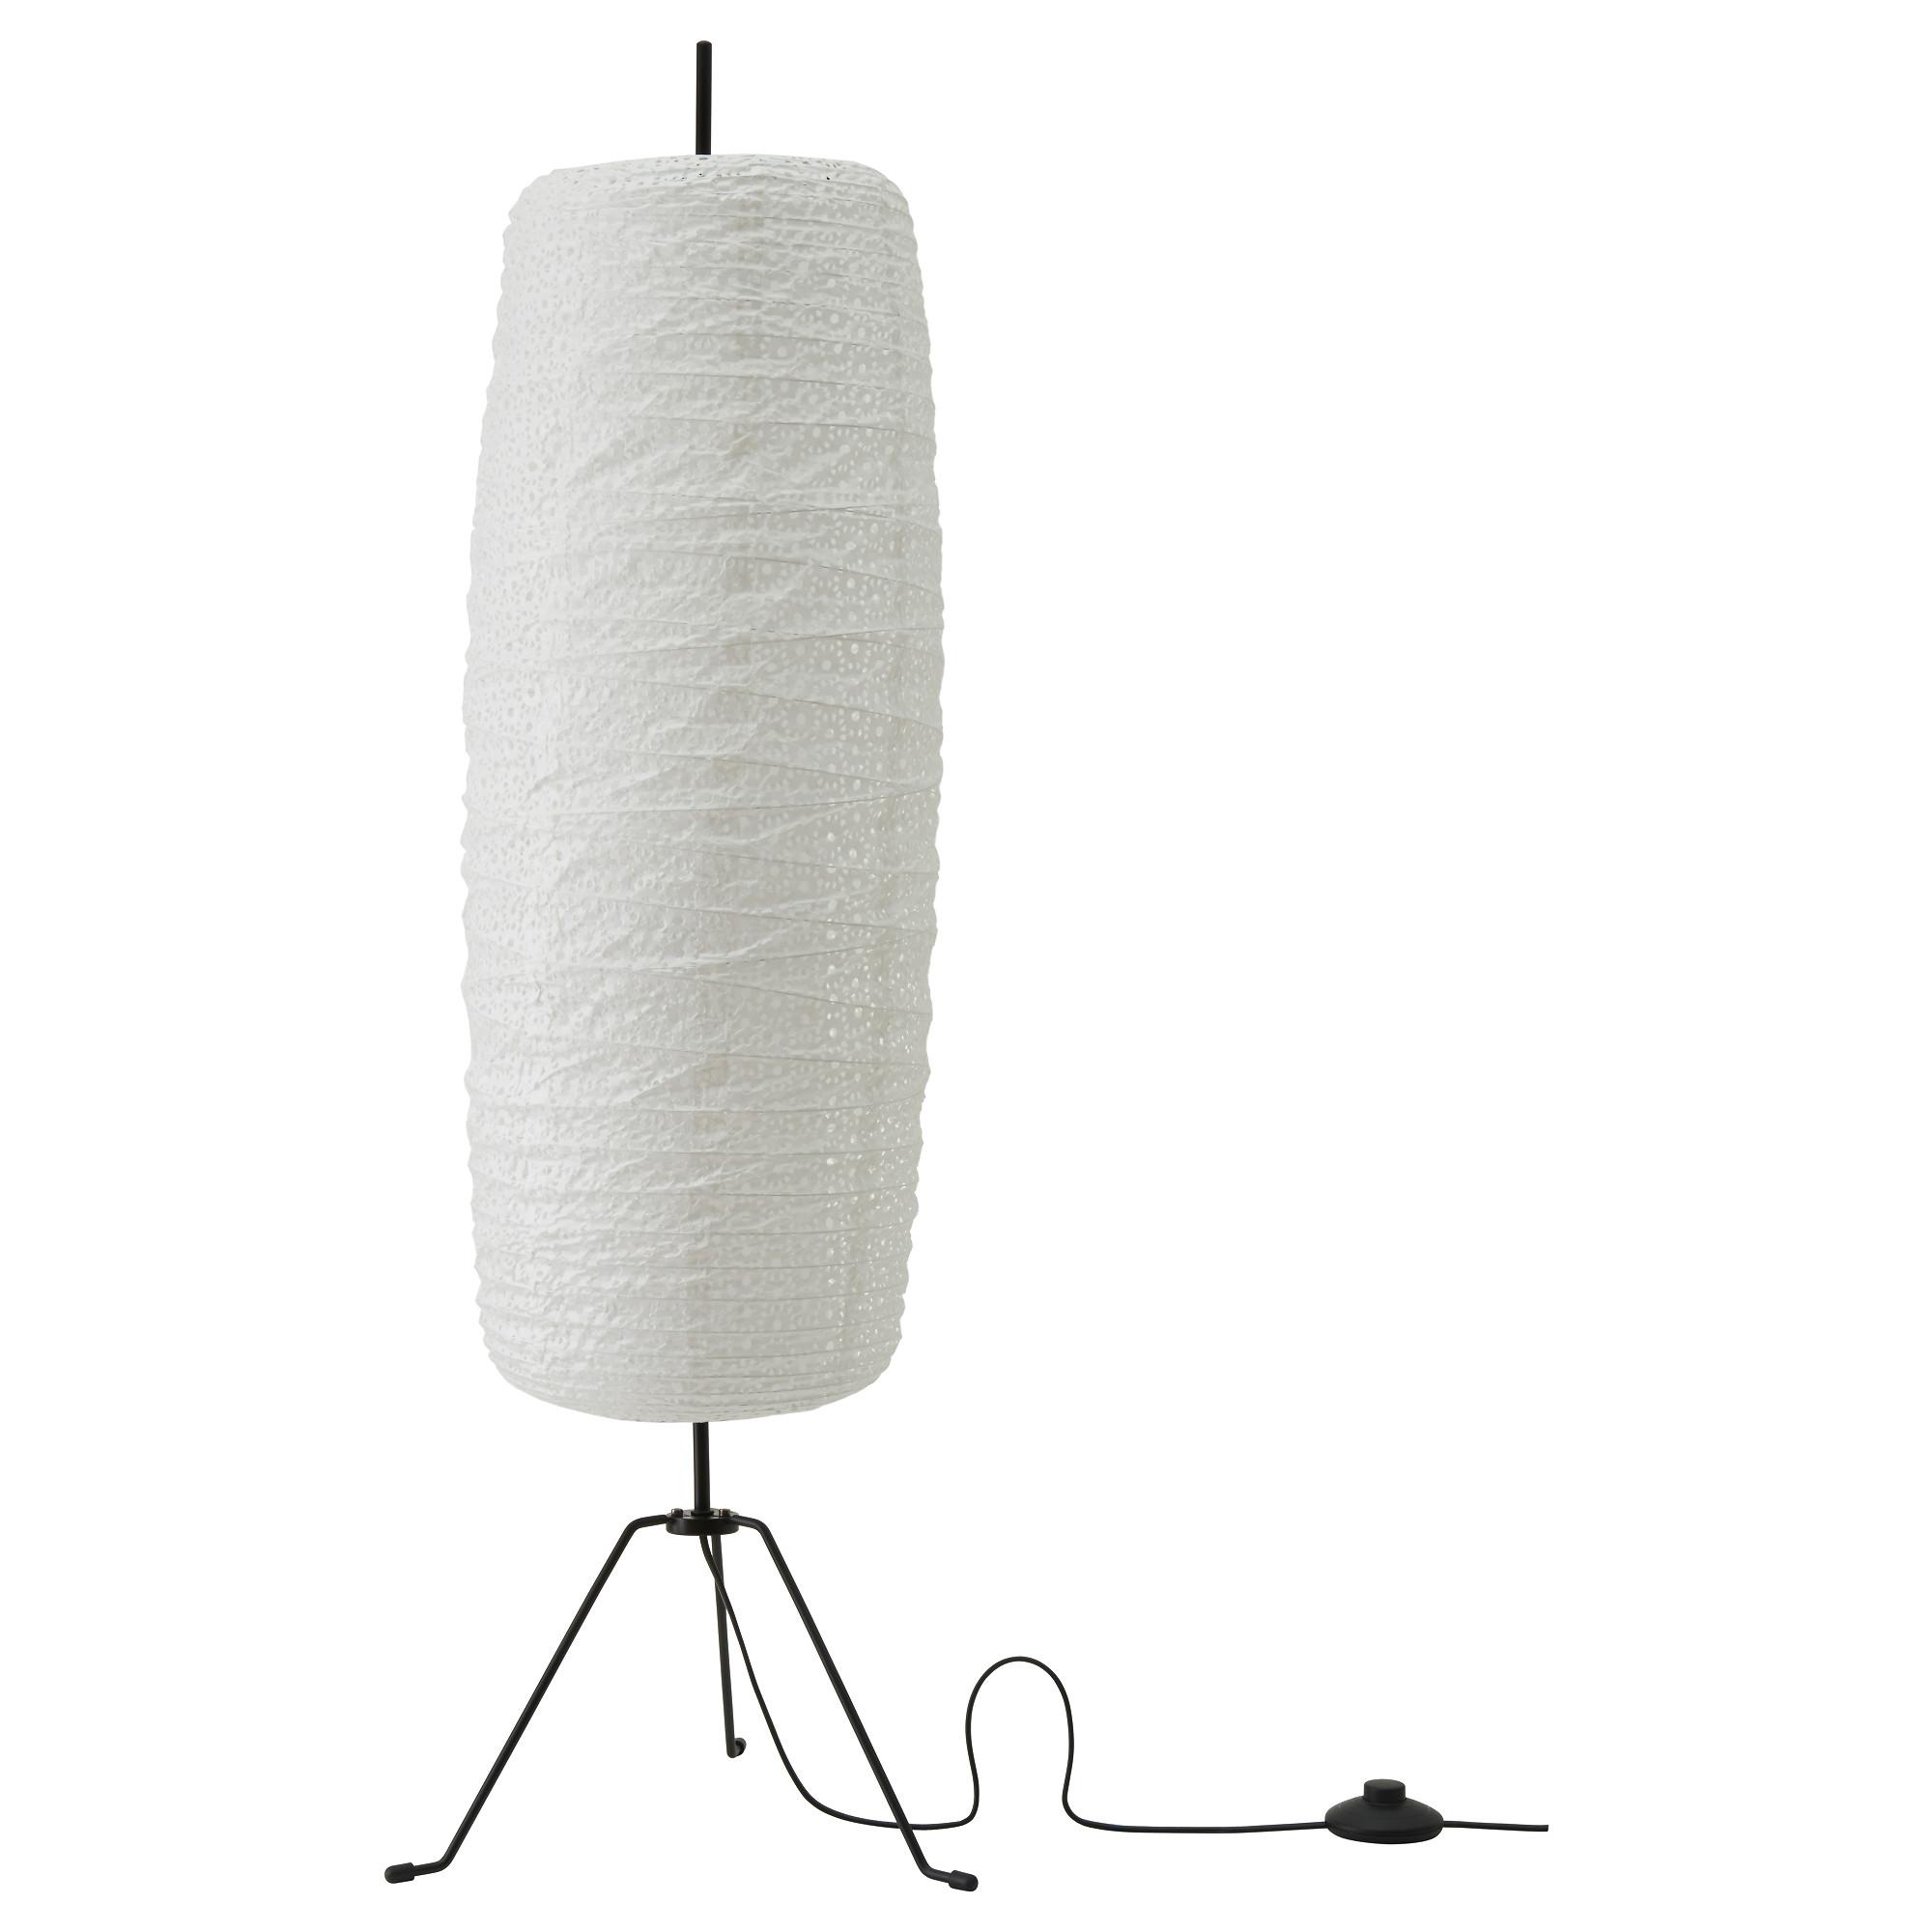 Офисная настольная лампа Arte lamp Flamingo A2250LT-1SS